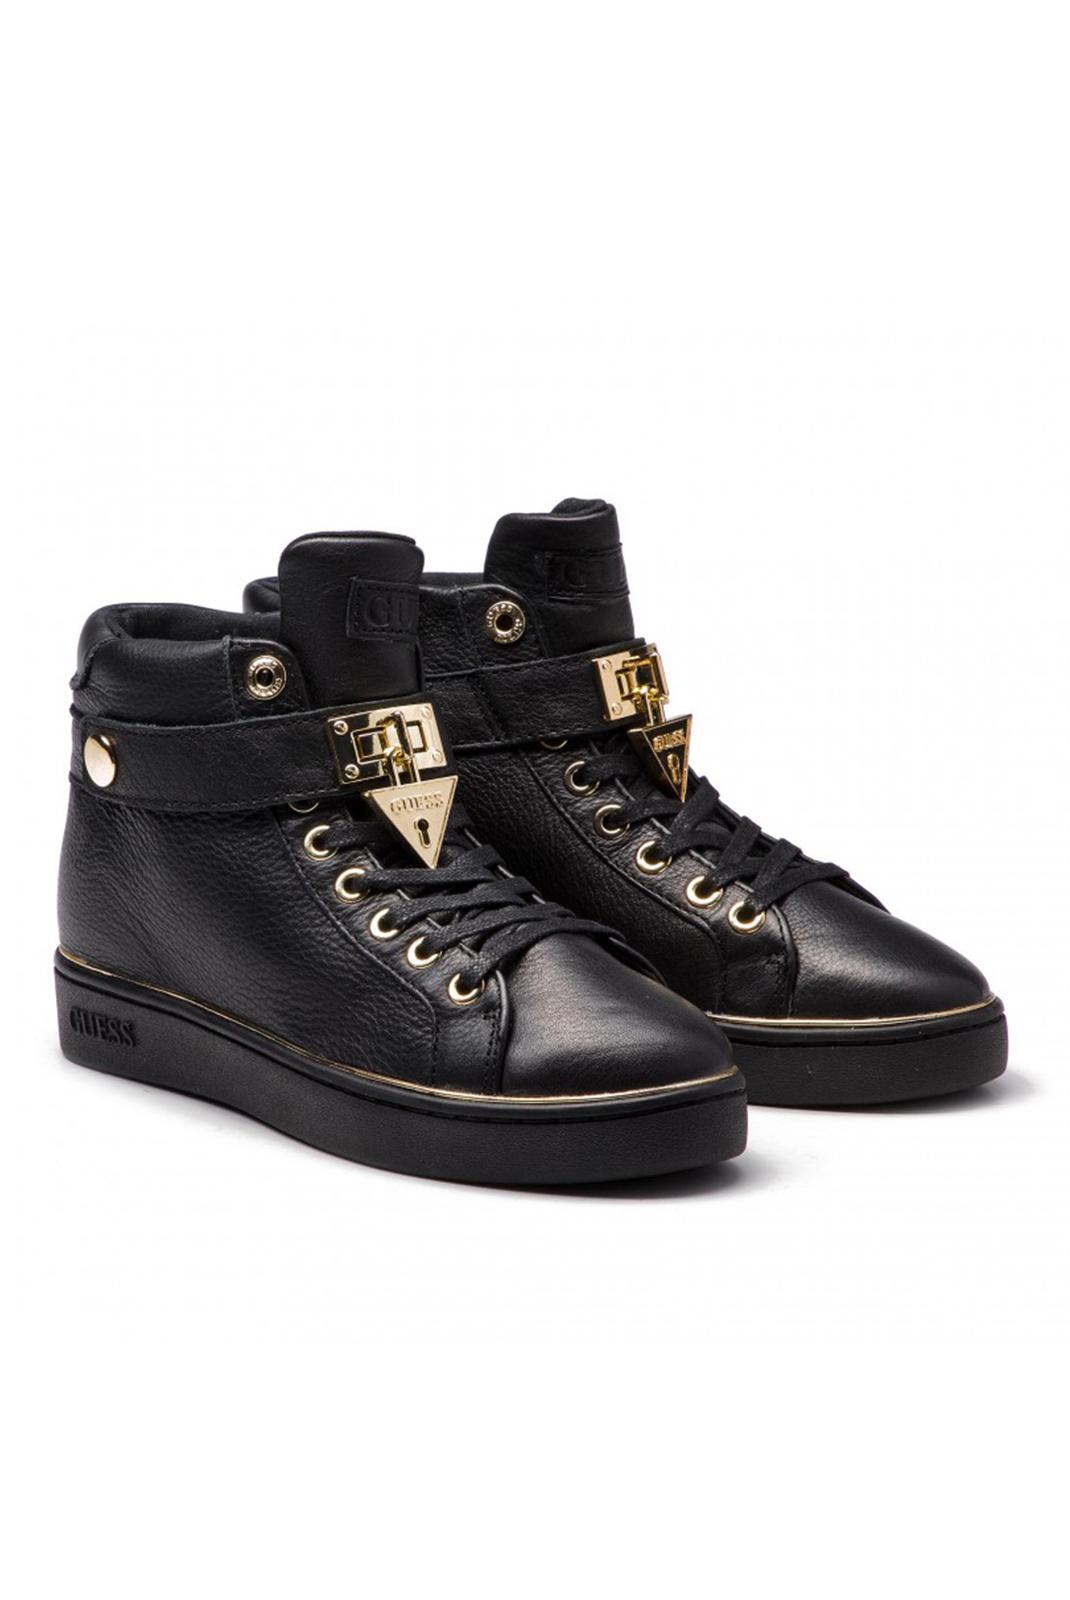 Baskets / Sneakers  Guess jeans FLBOG4 LEA12 BLACK